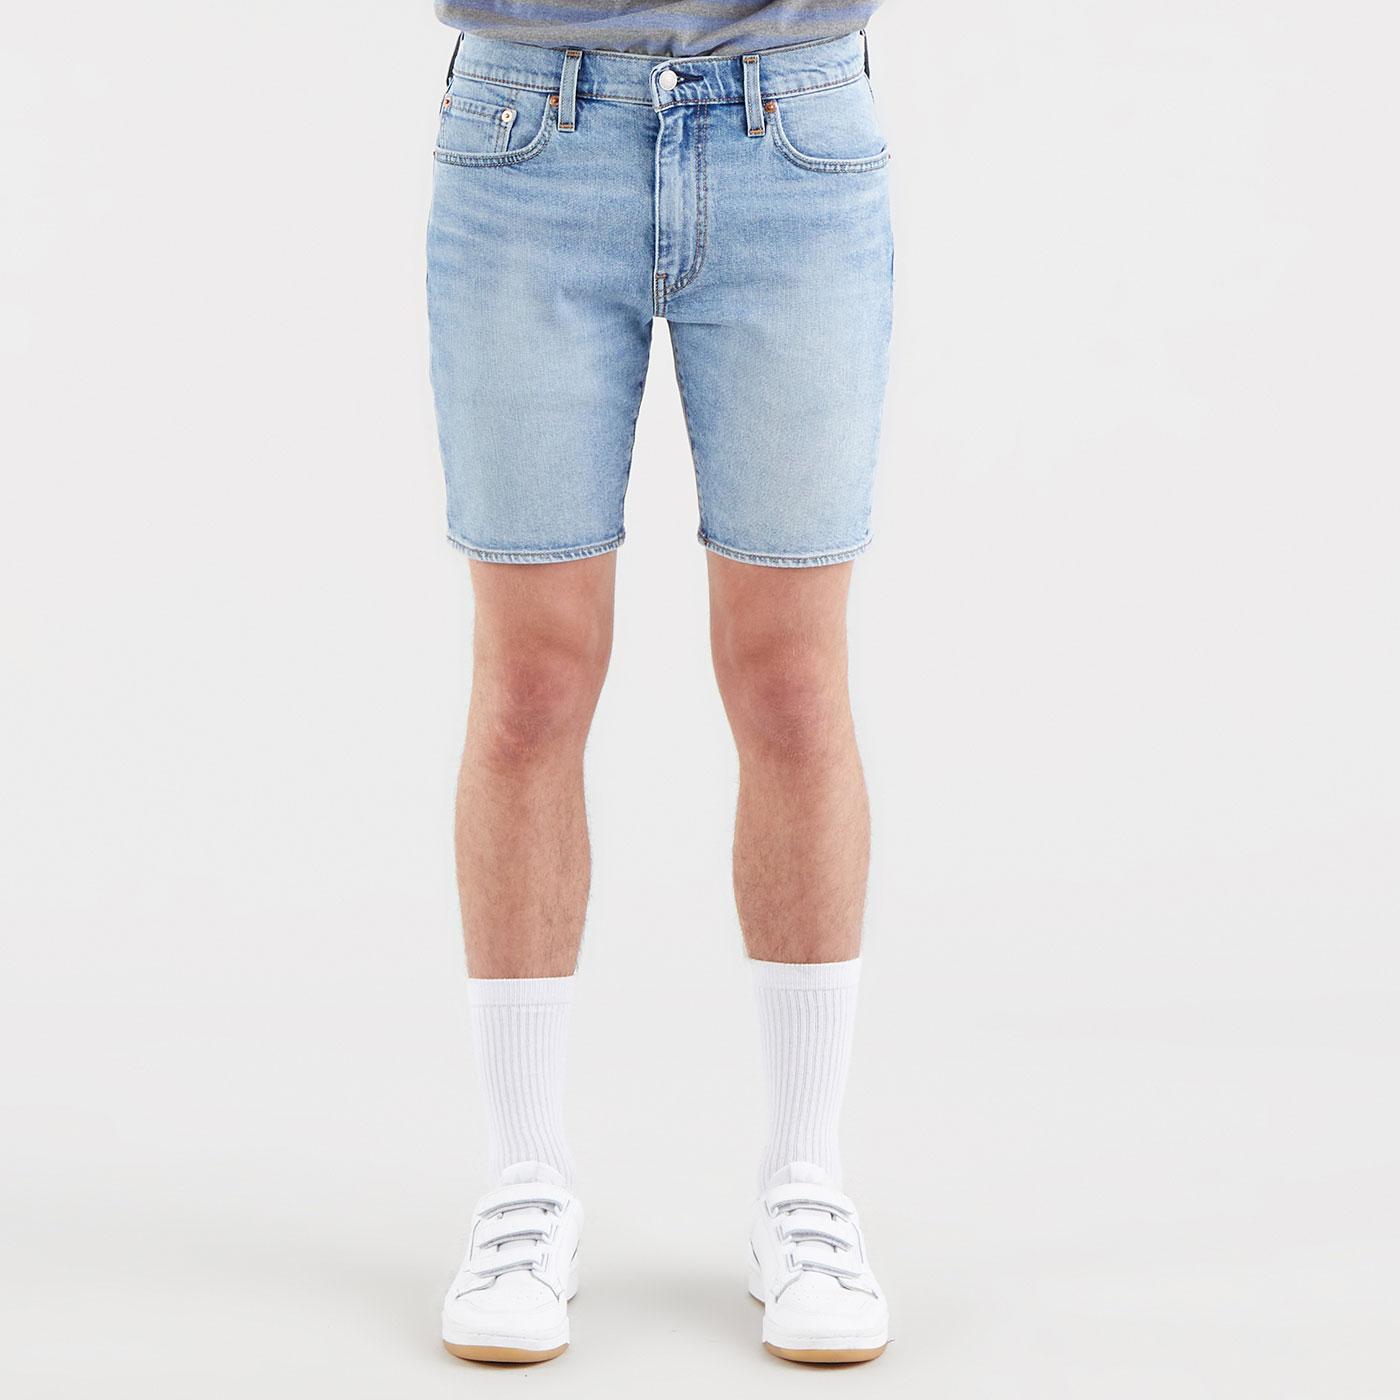 LEVI'S 412 Slim Denim Shorts (Whenever Wherever)